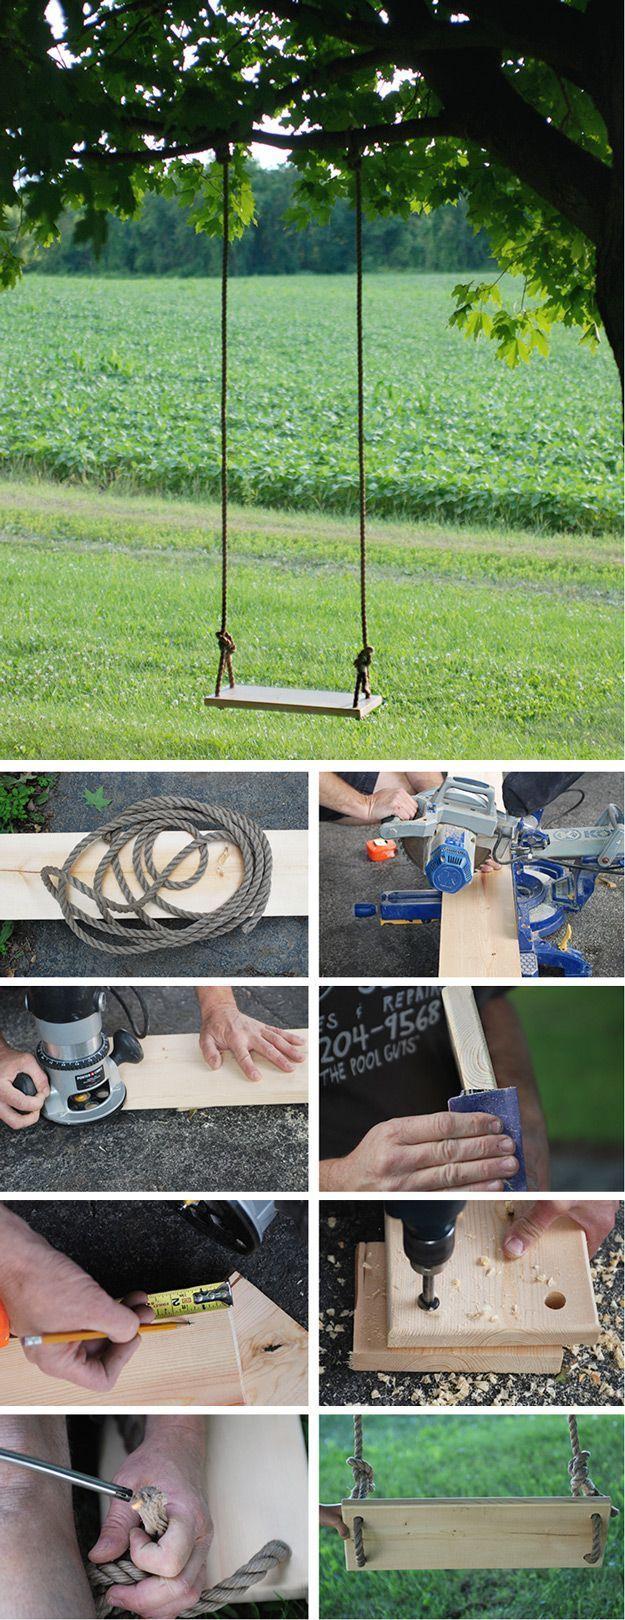 DIY Tree Swing   Backyard Play Area Projects by DIY Ready at http://diyready.com/easy-backyard-projects/